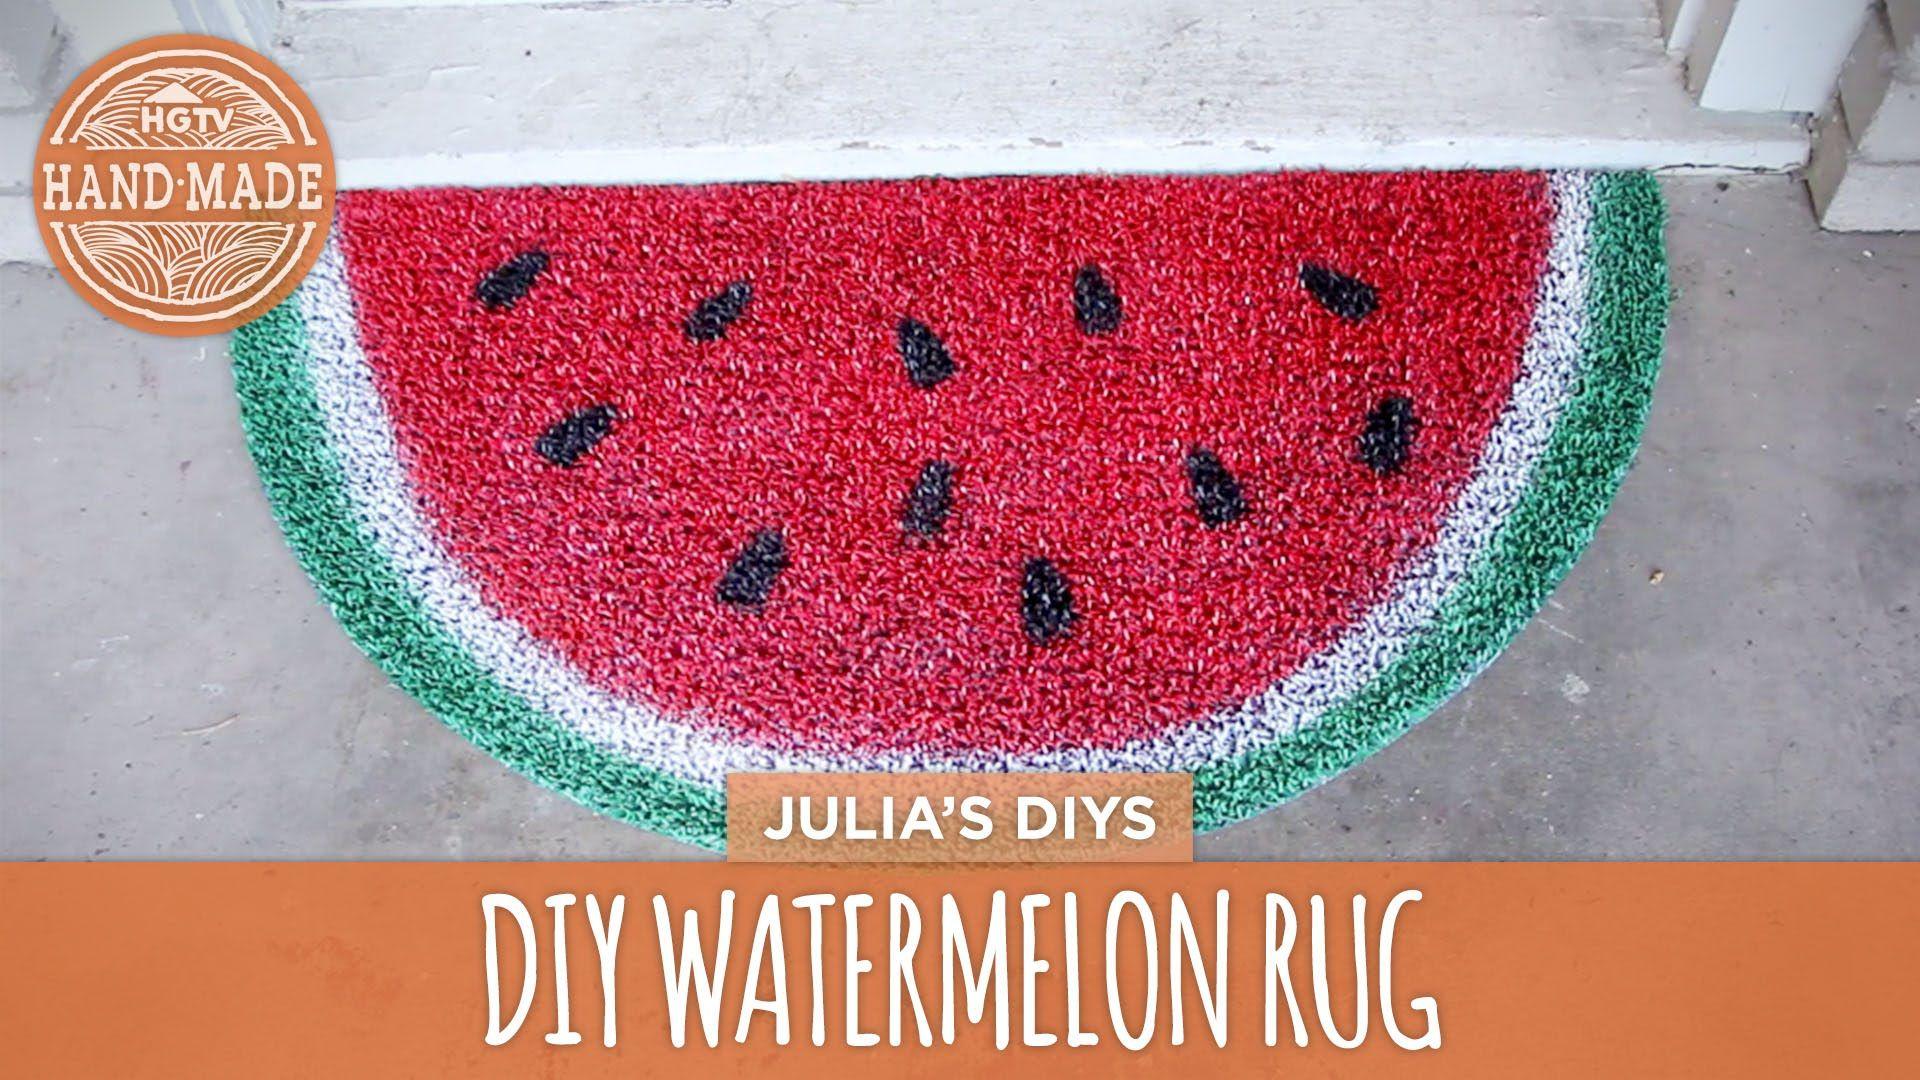 DIY Watermelon Rug - HGTV Handmade